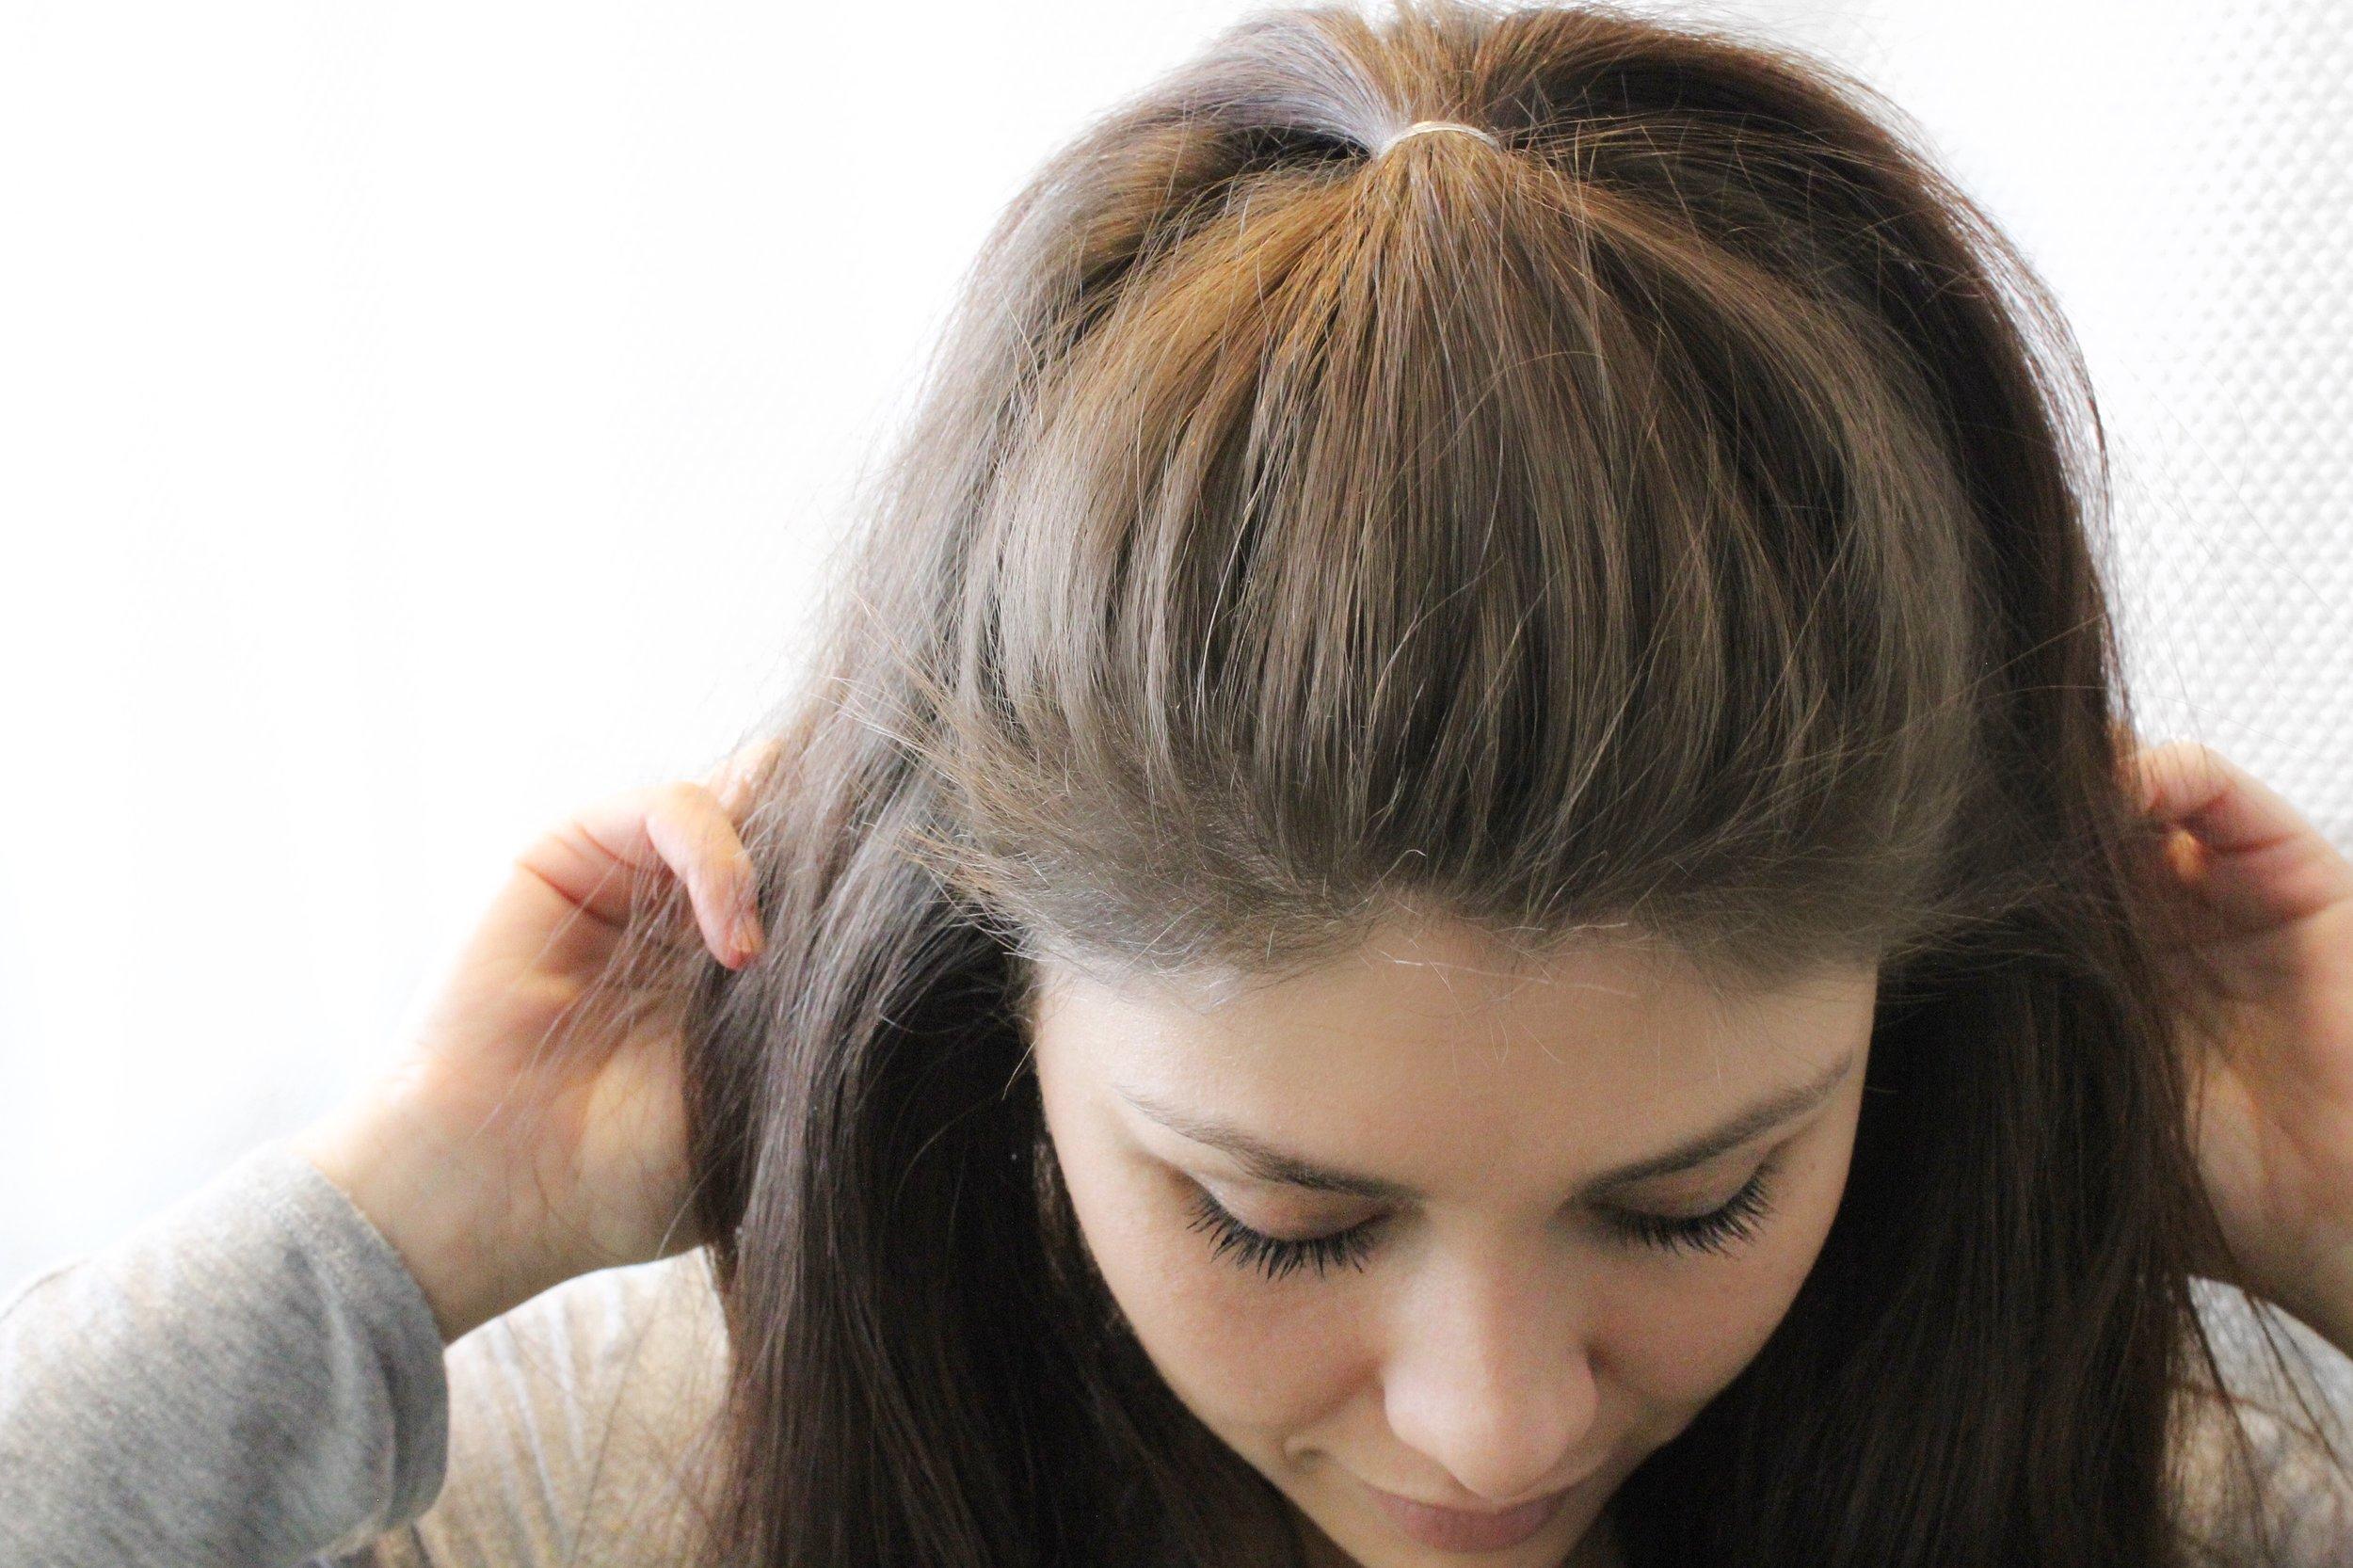 dirty-hair-hairstyles.JPG